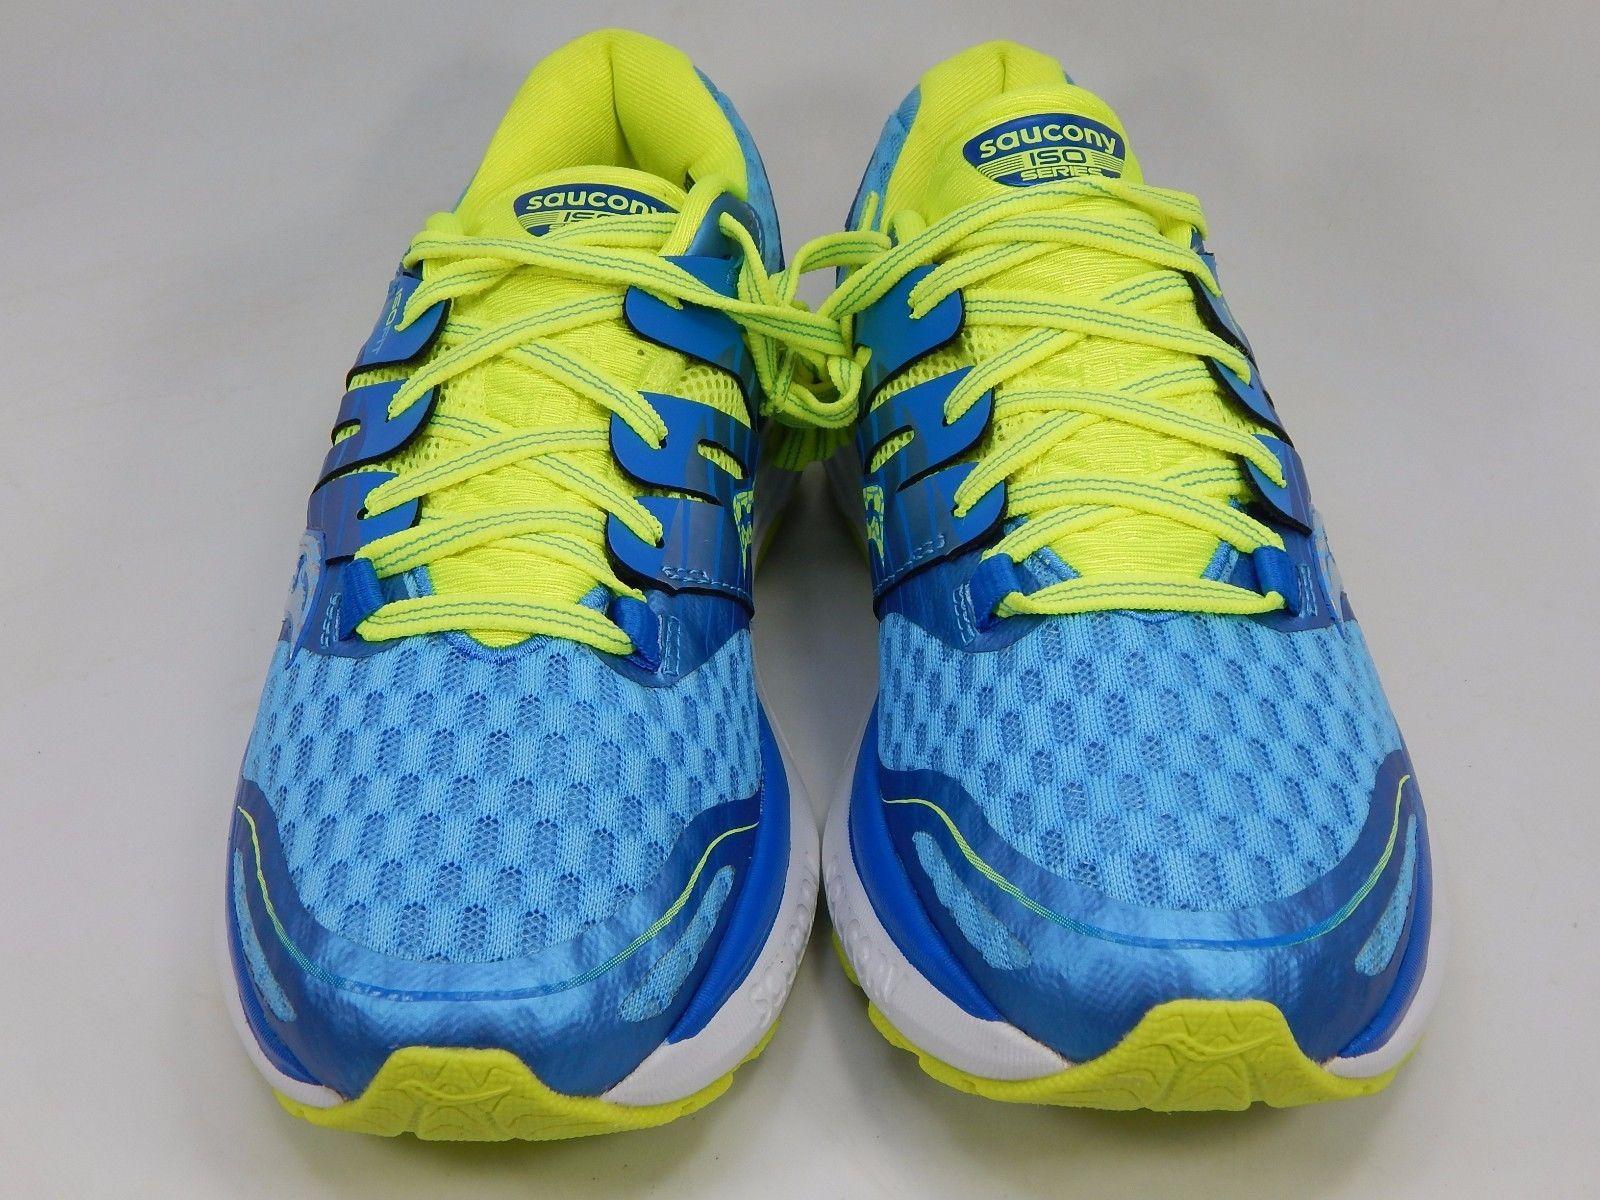 Saucony Triumph ISO 2 Women's Running Shoes Size US 8 M (B) EU 39 Blue S10290-4